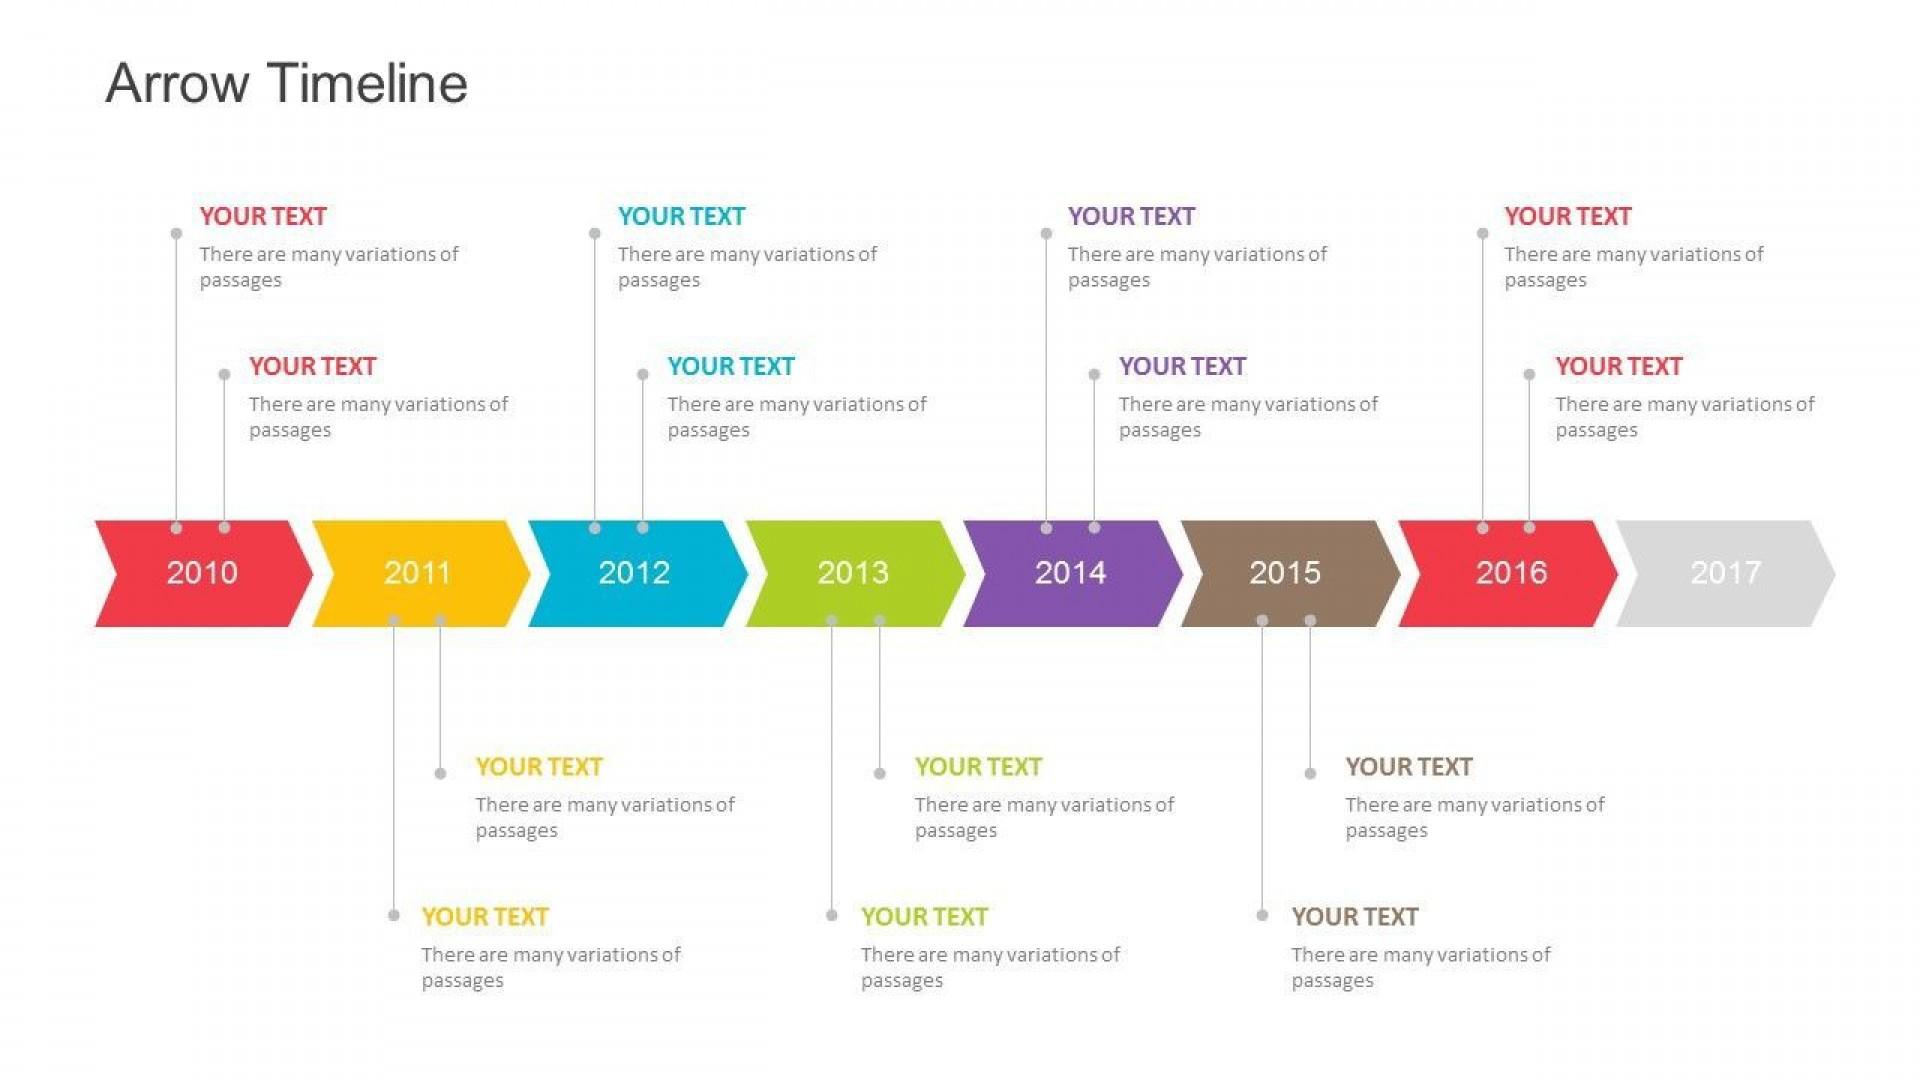 002 Unusual Timeline Presentation Template Free Download Sample 1920